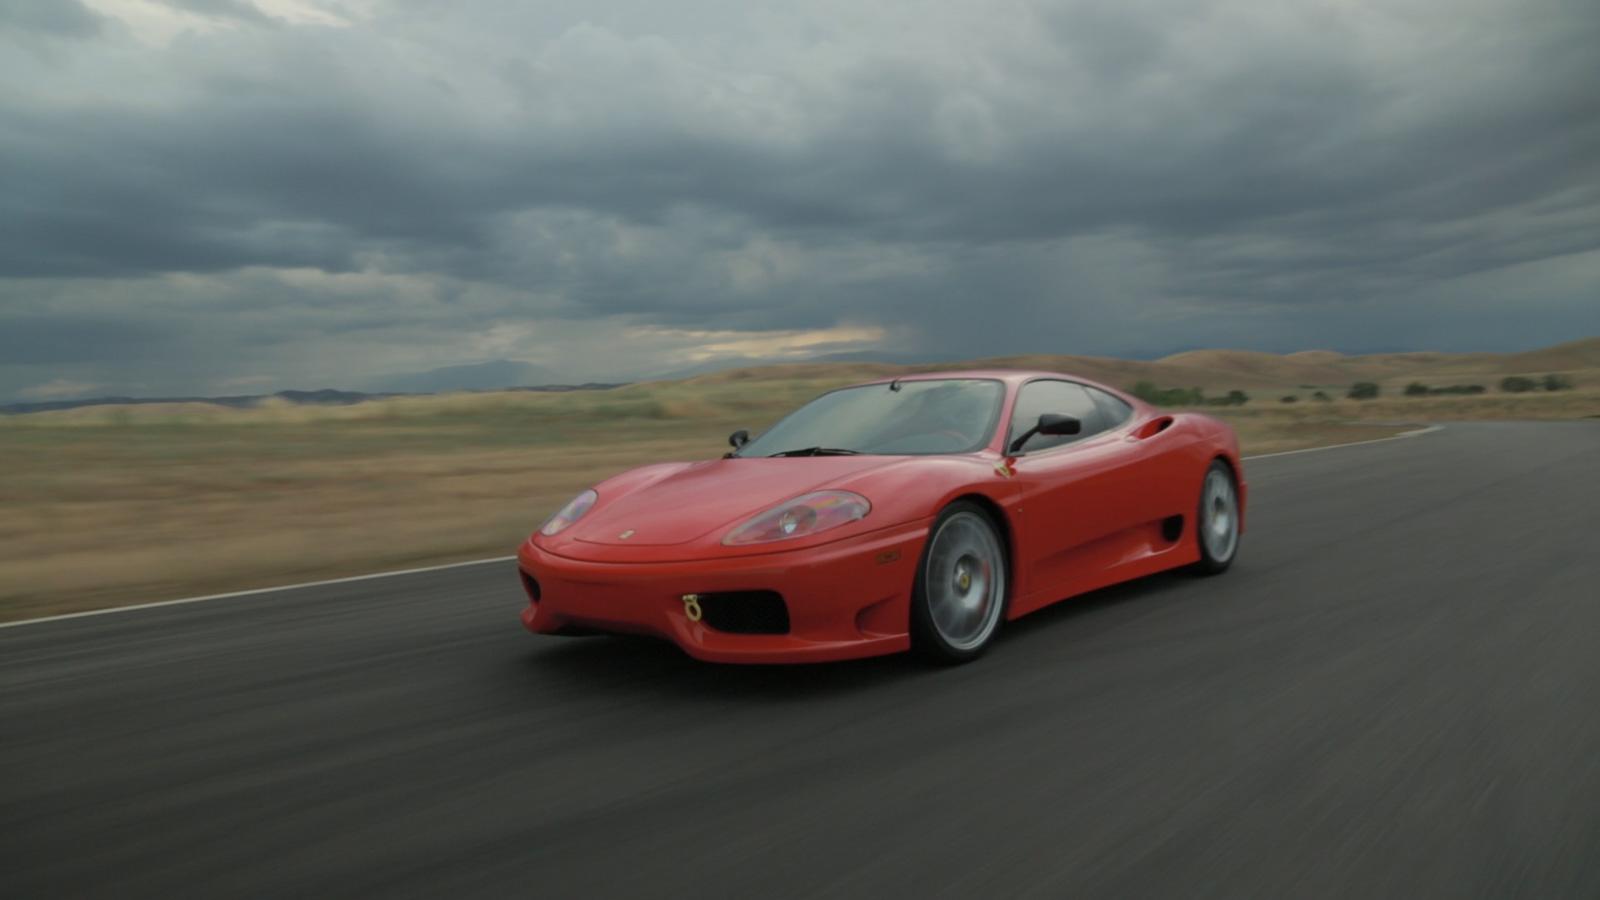 ferrari 4%2B%25281%2529 10 λόγοι που η Ferrari 360 Challenge Stradale ανήκει στο γκαράζ των ονείρων μας Ferrari, Ferrari 360 Challenge Stradale, Ferrari 360 Modena, Ferrari Challenge Stradale, videos